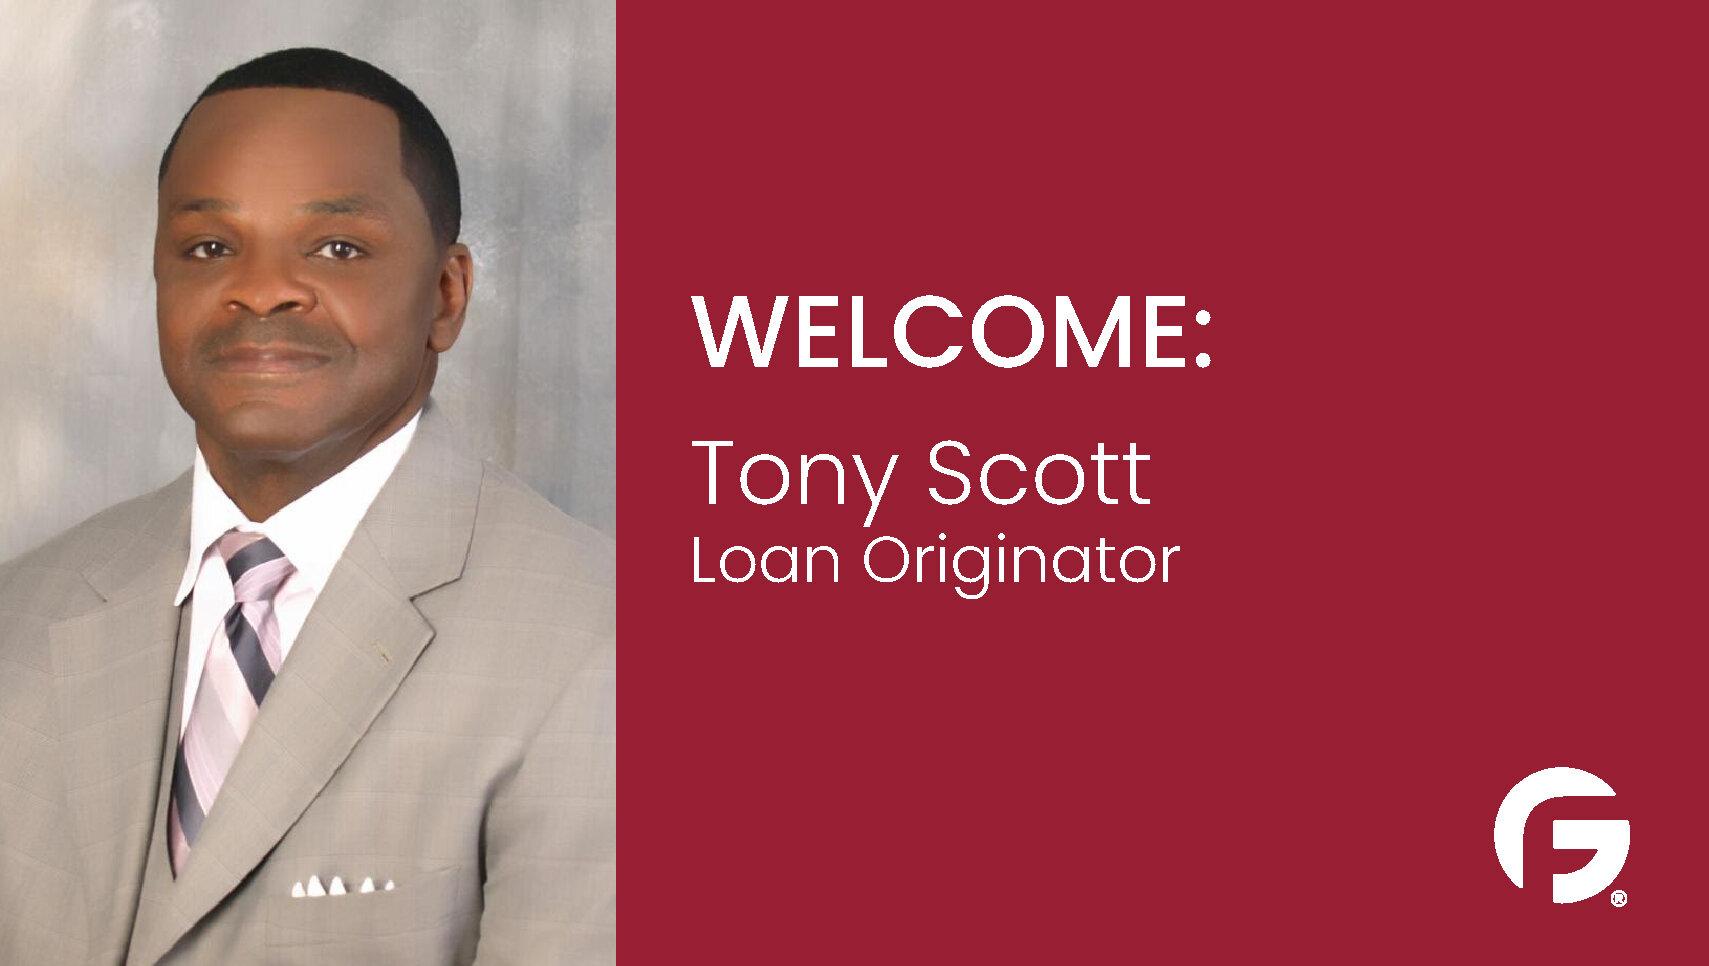 Tony Scott Loan Originator